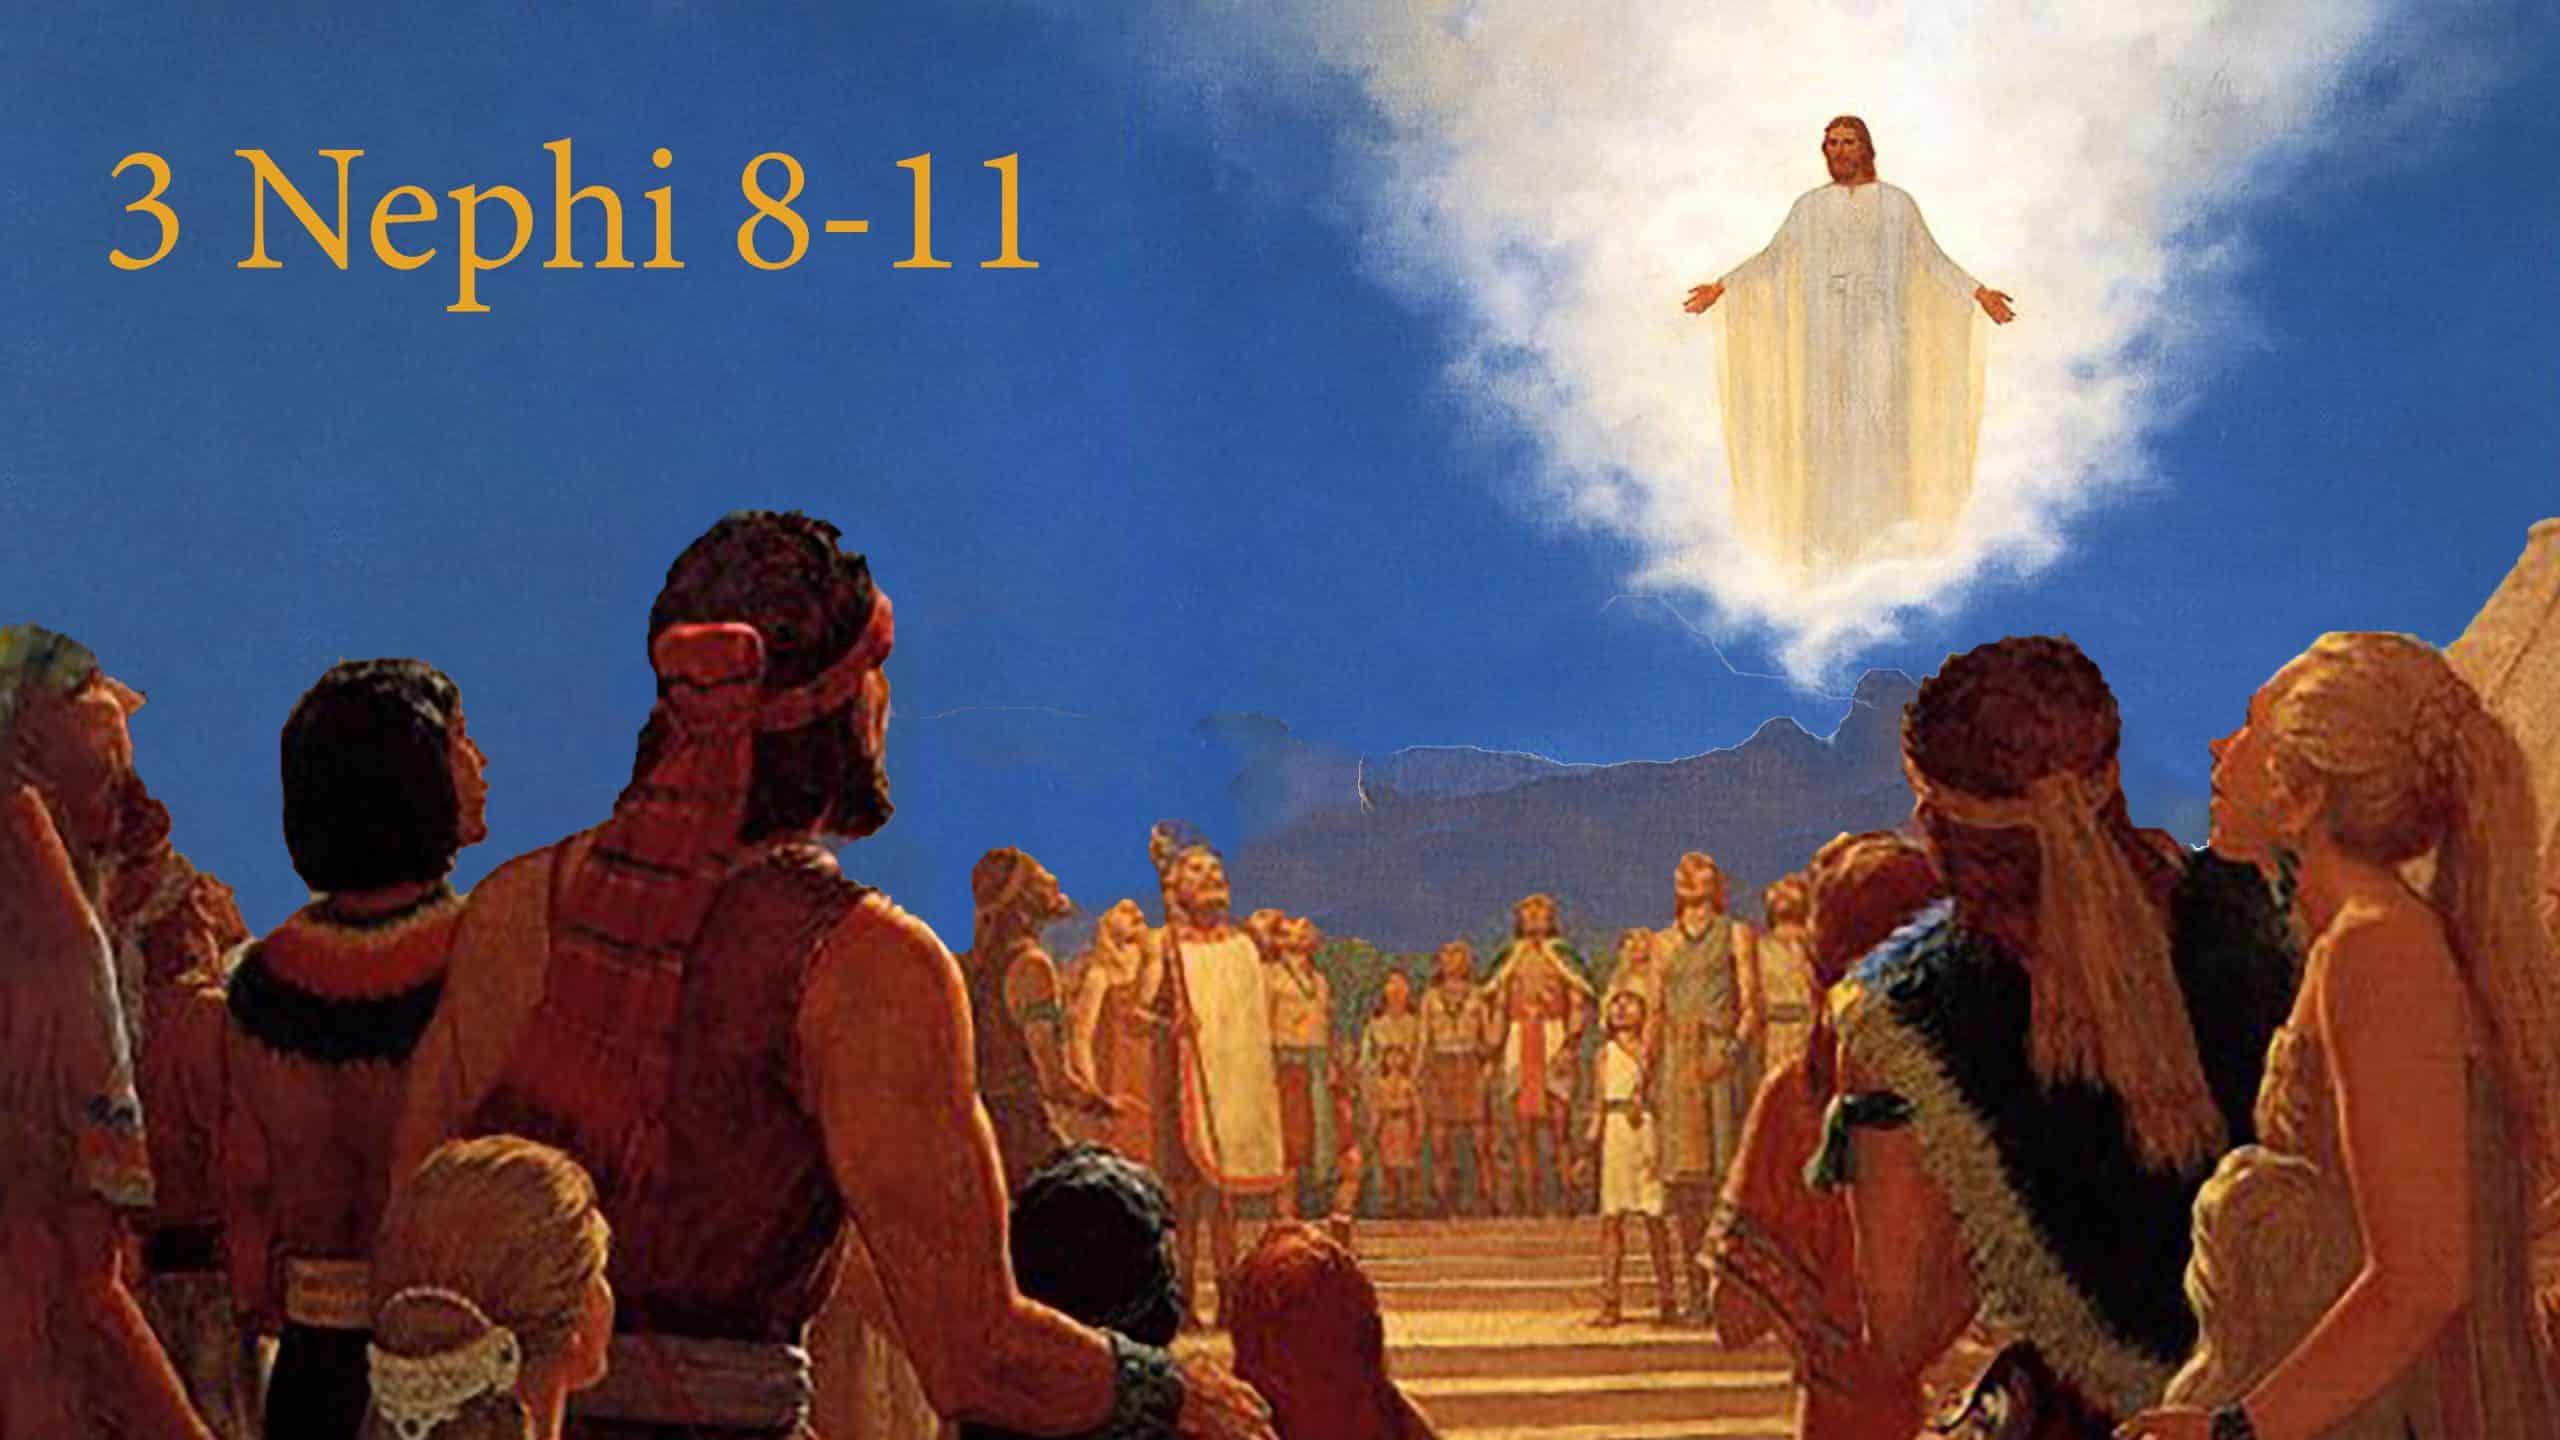 Jesus descending down to the Nephites